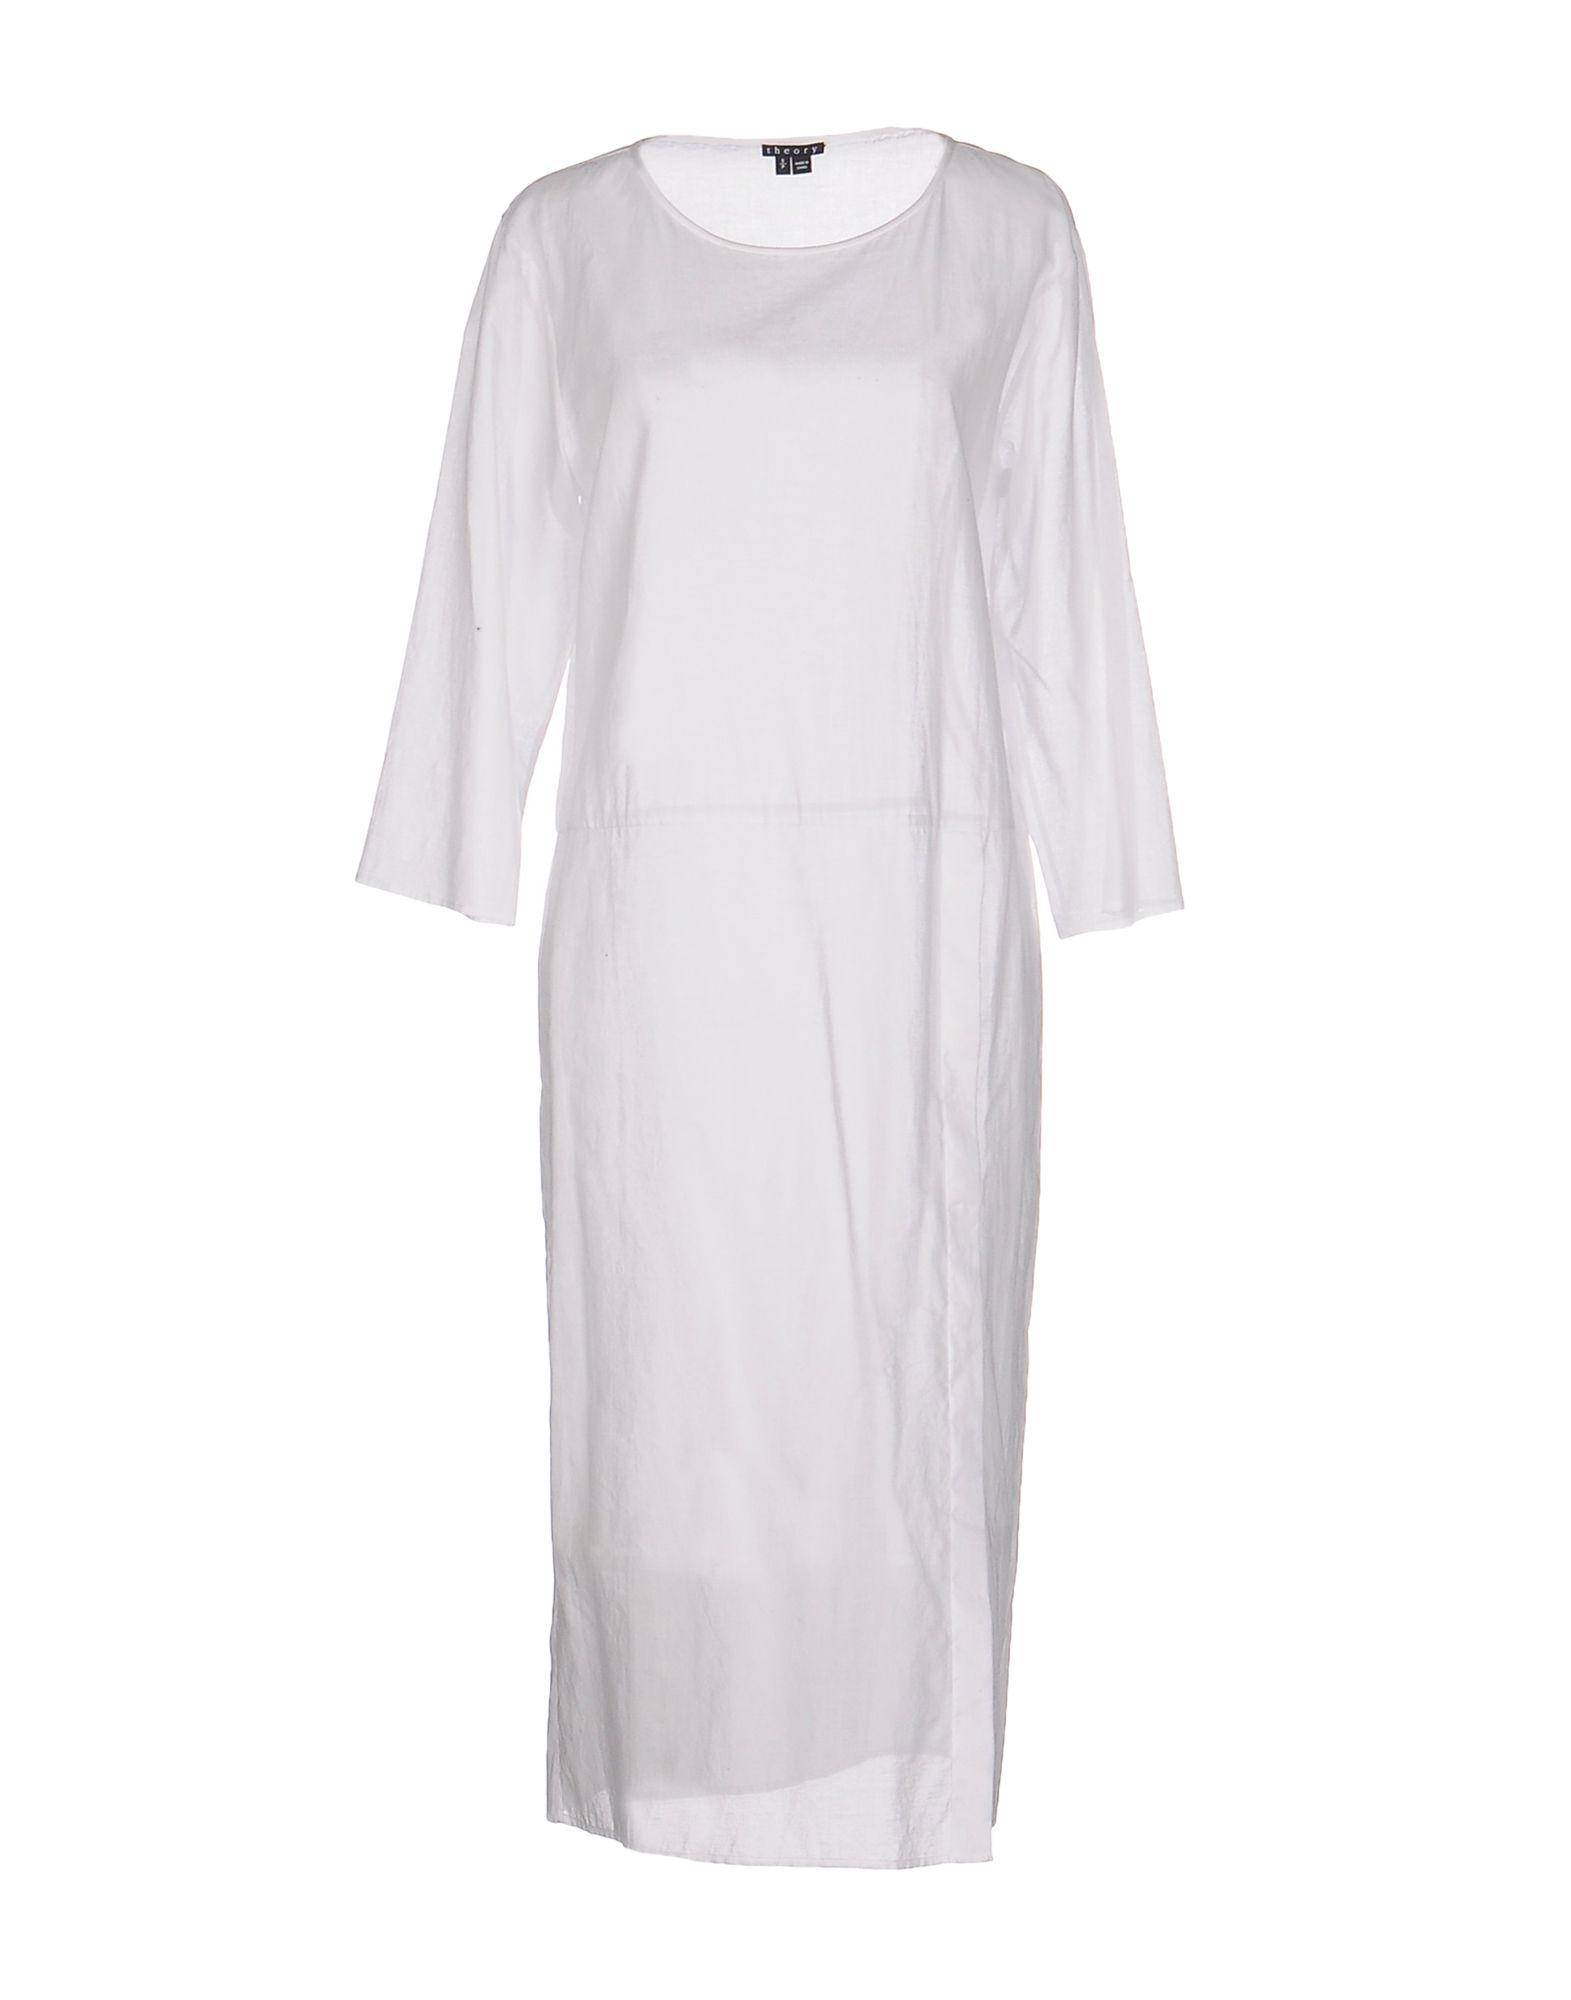 THEORY Платье длиной 3/4 lisa corti платье длиной 3 4